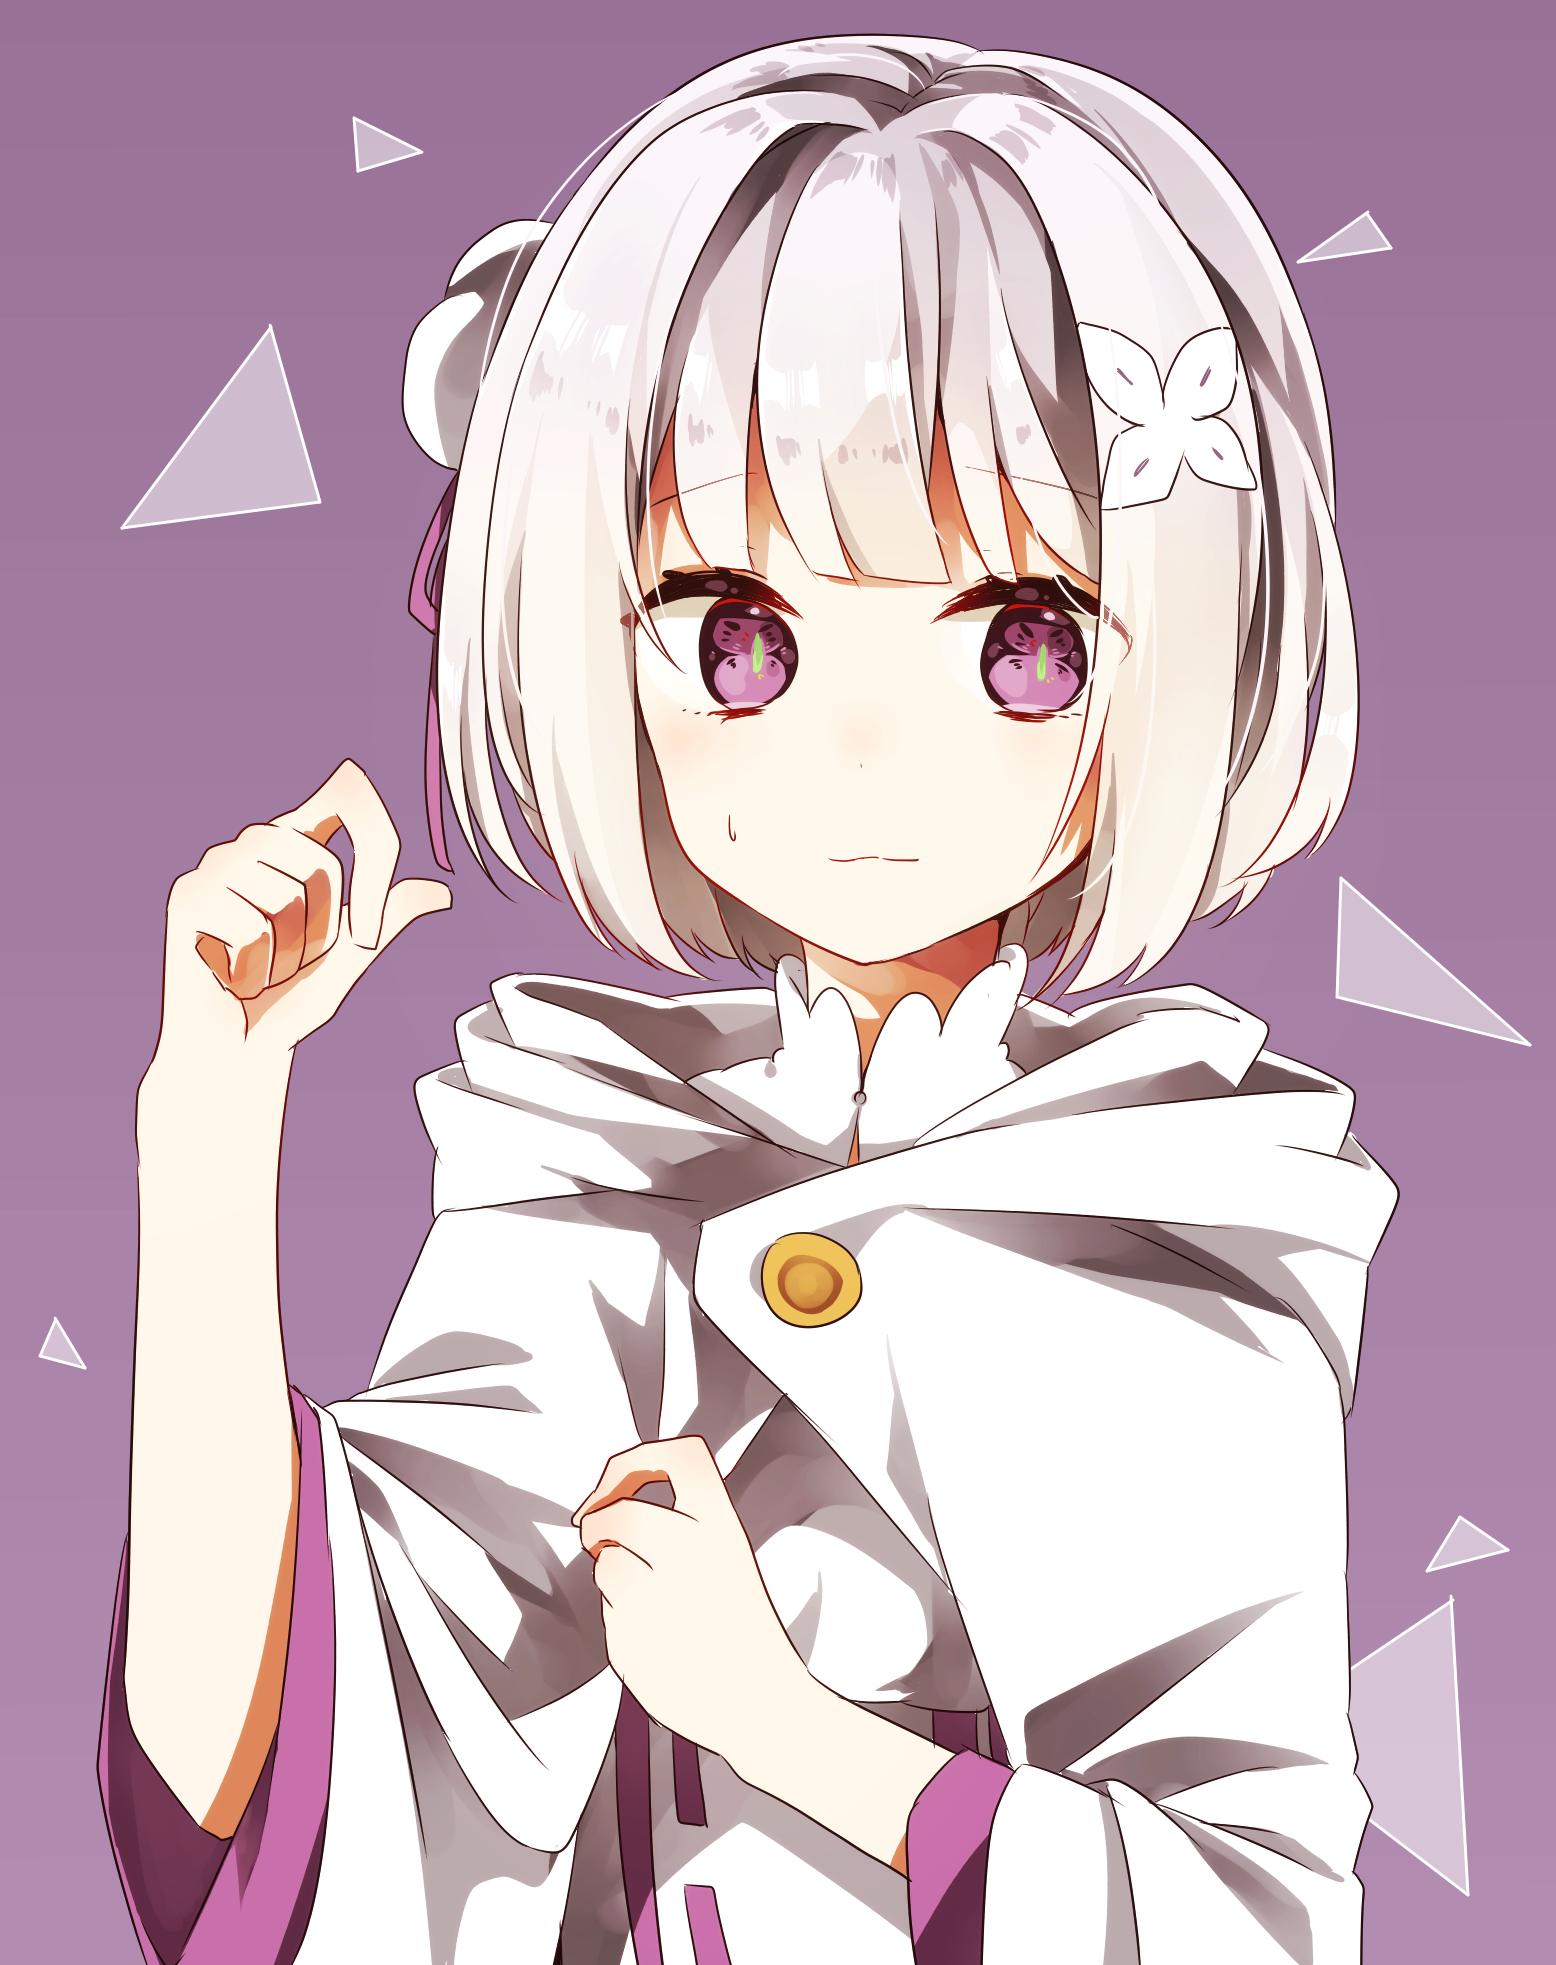 """Emilia"" 可愛いアニメガール, カワイイアニメ, マンガアニメ"